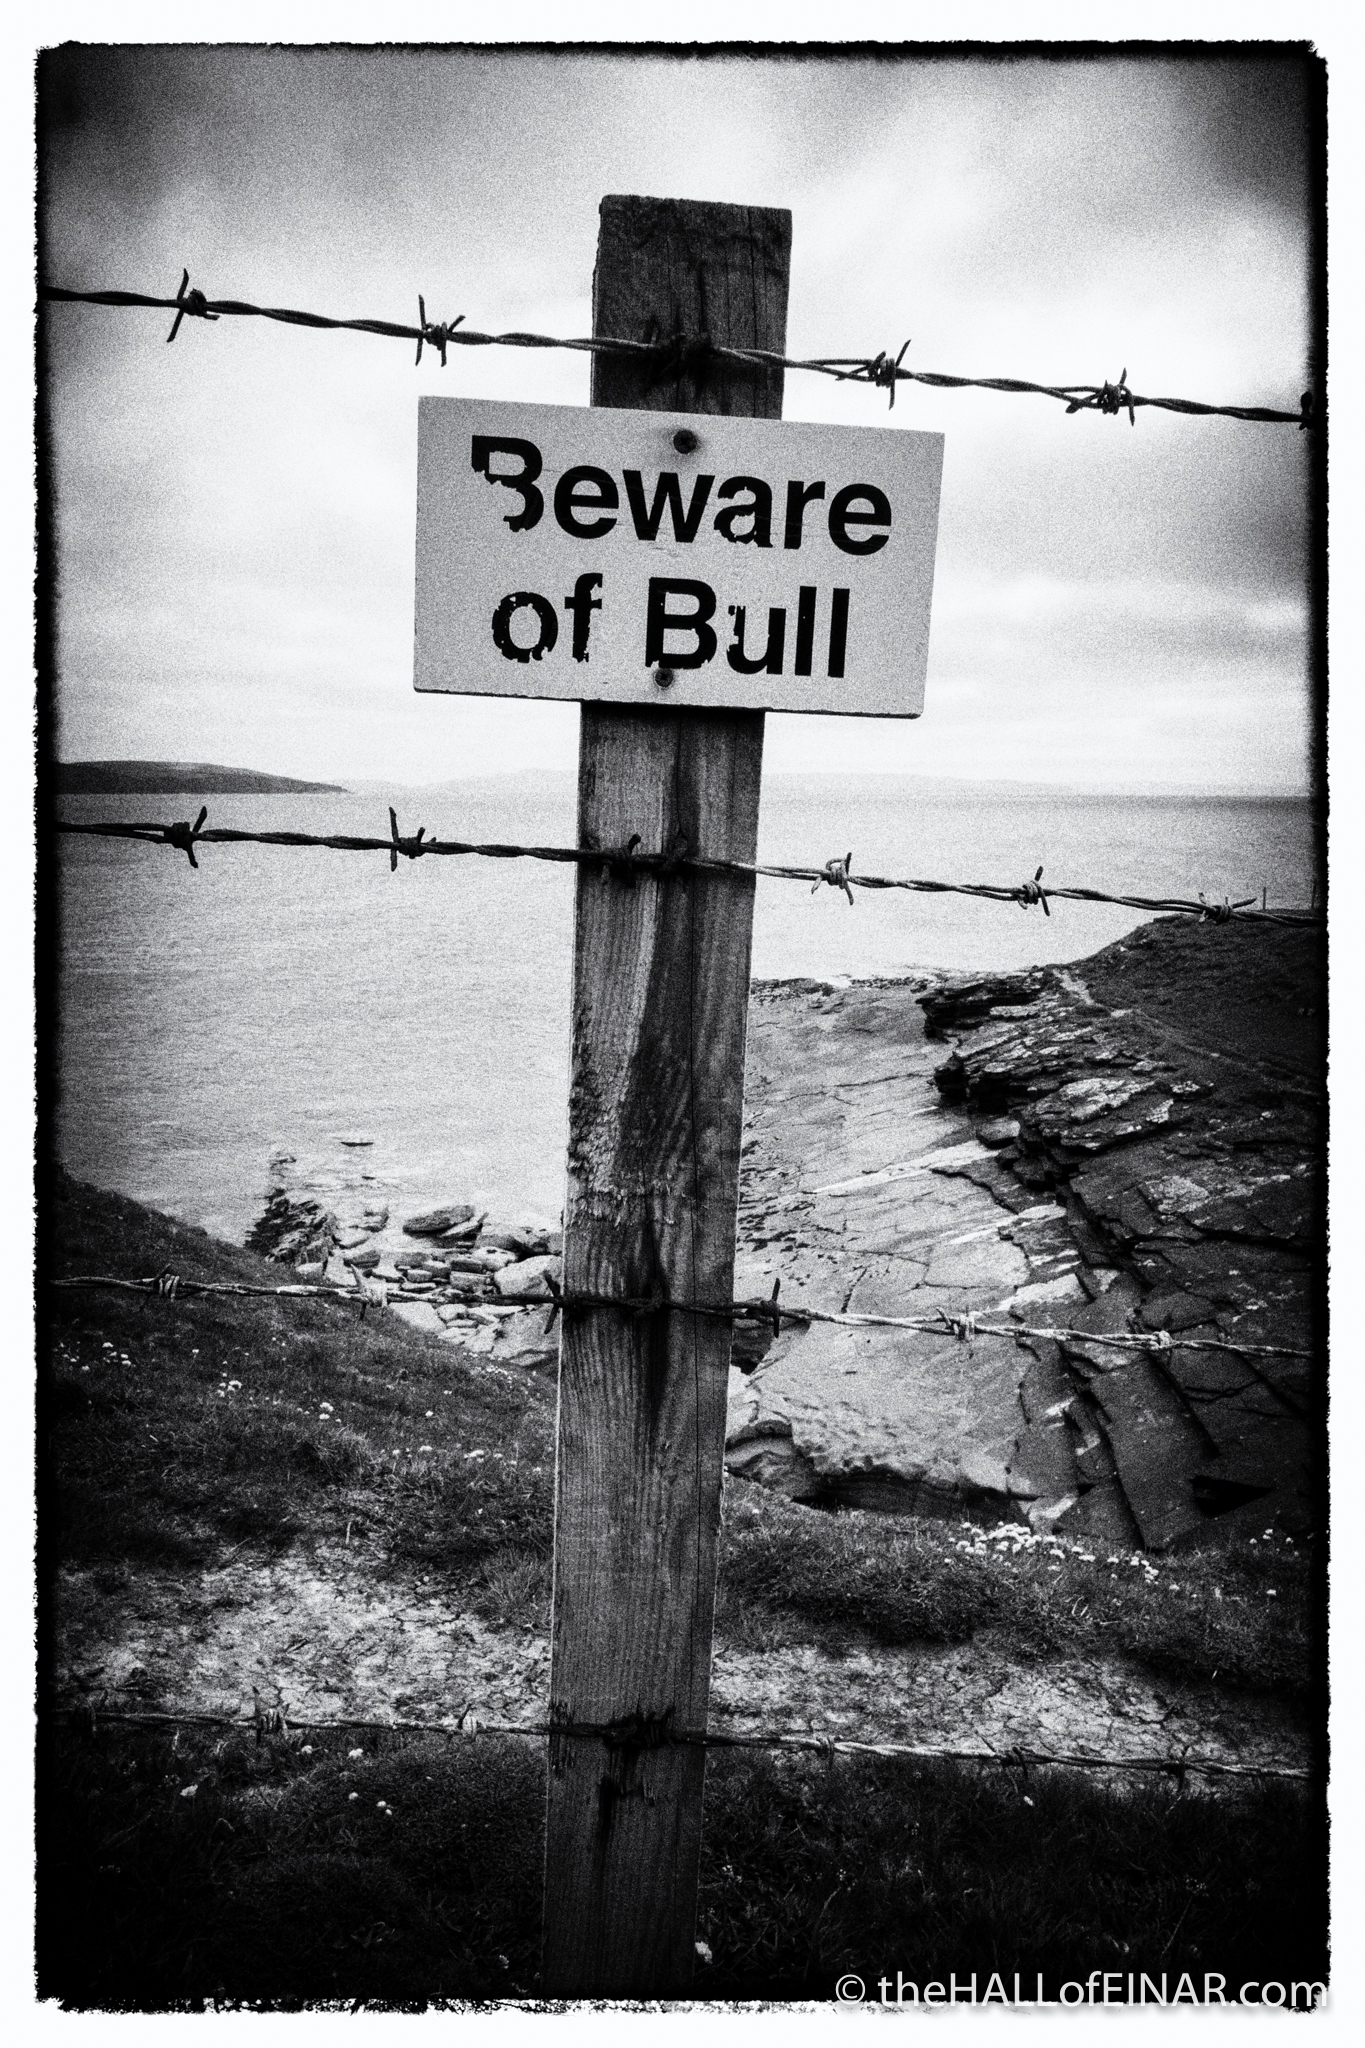 Beware of Bull - photograph (c) 2016 David Bailey (not the)